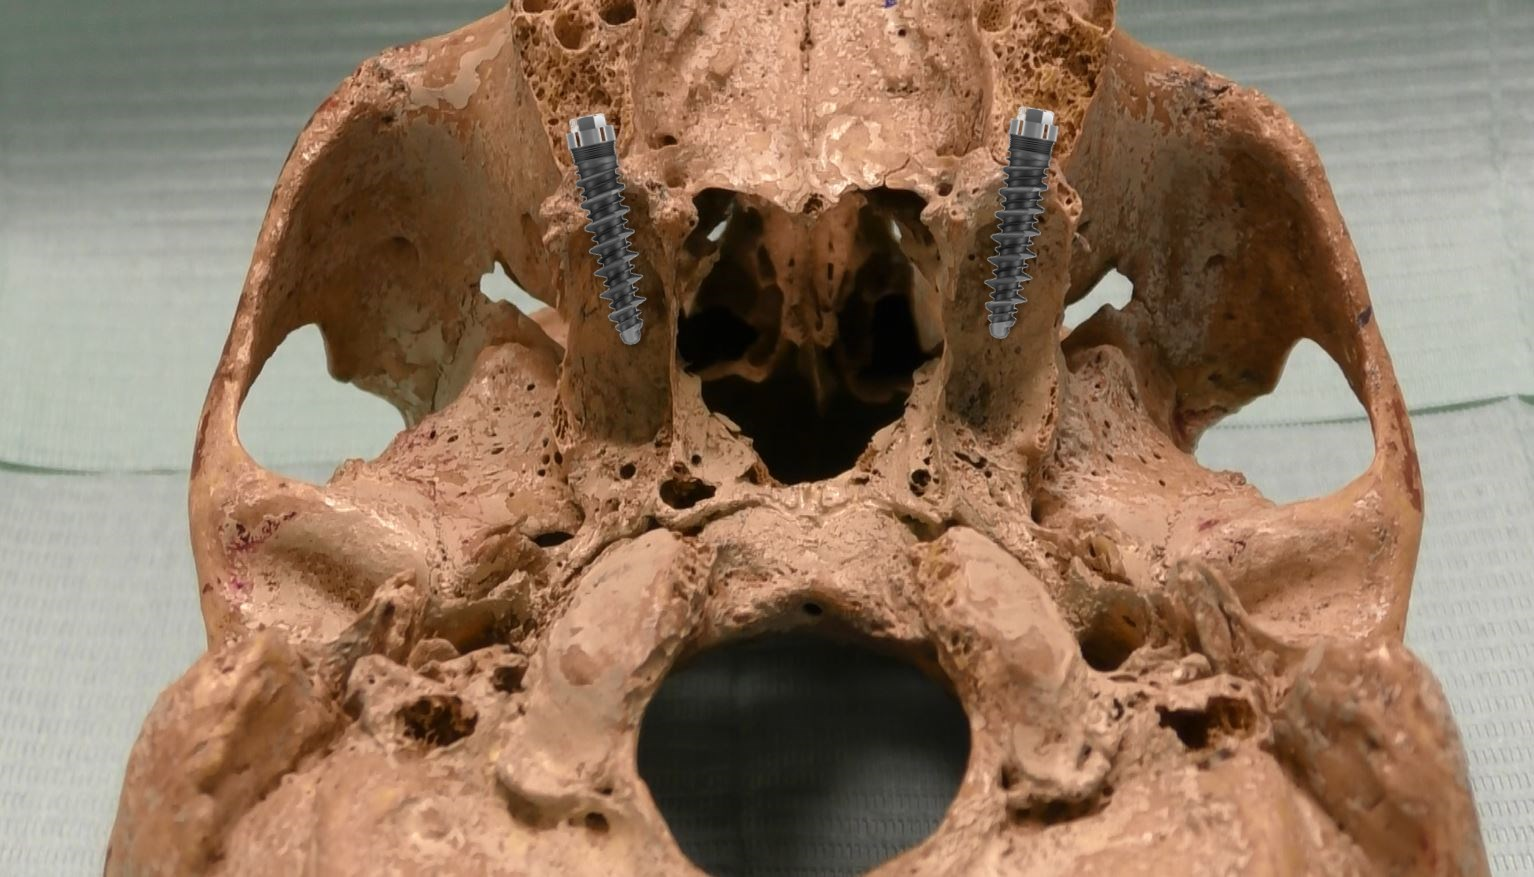 Innesto d'osso dentale – Impianto osseo dentale prezzi